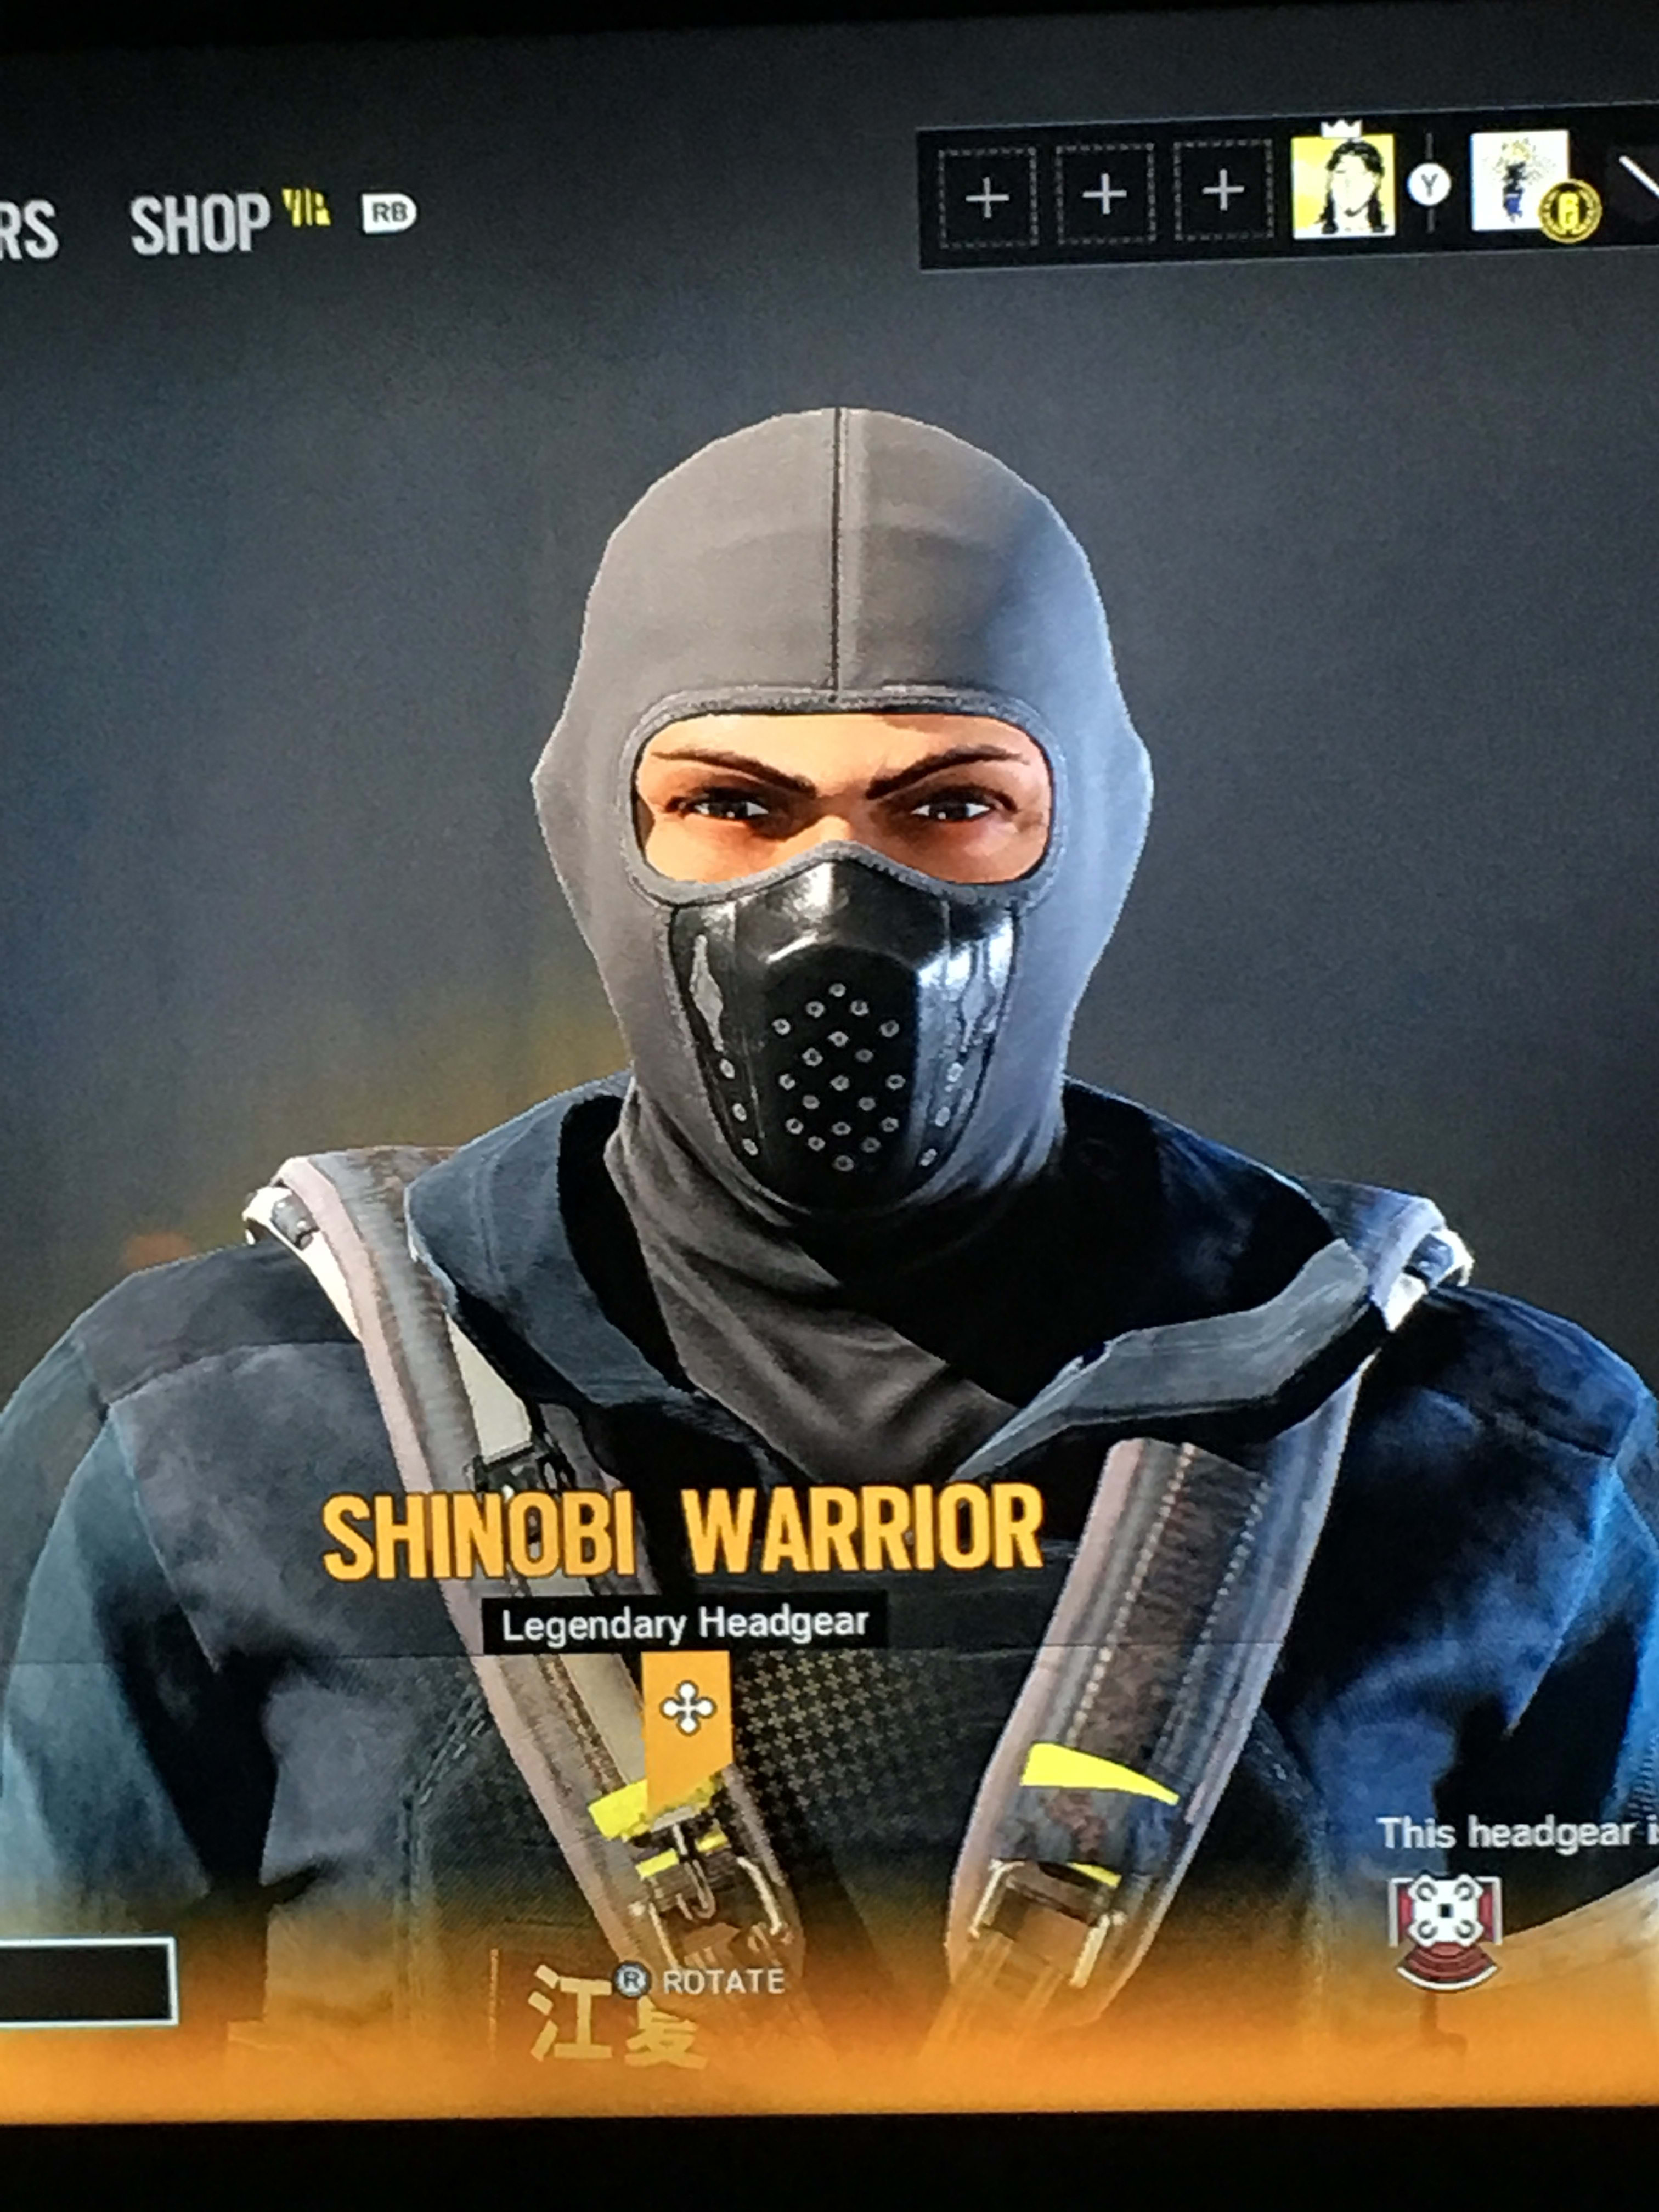 Rainbow Six Siege On Roblox Play Fortnite Rainbow Six Siege And Roblox With You On Xbox One By Diamondman26